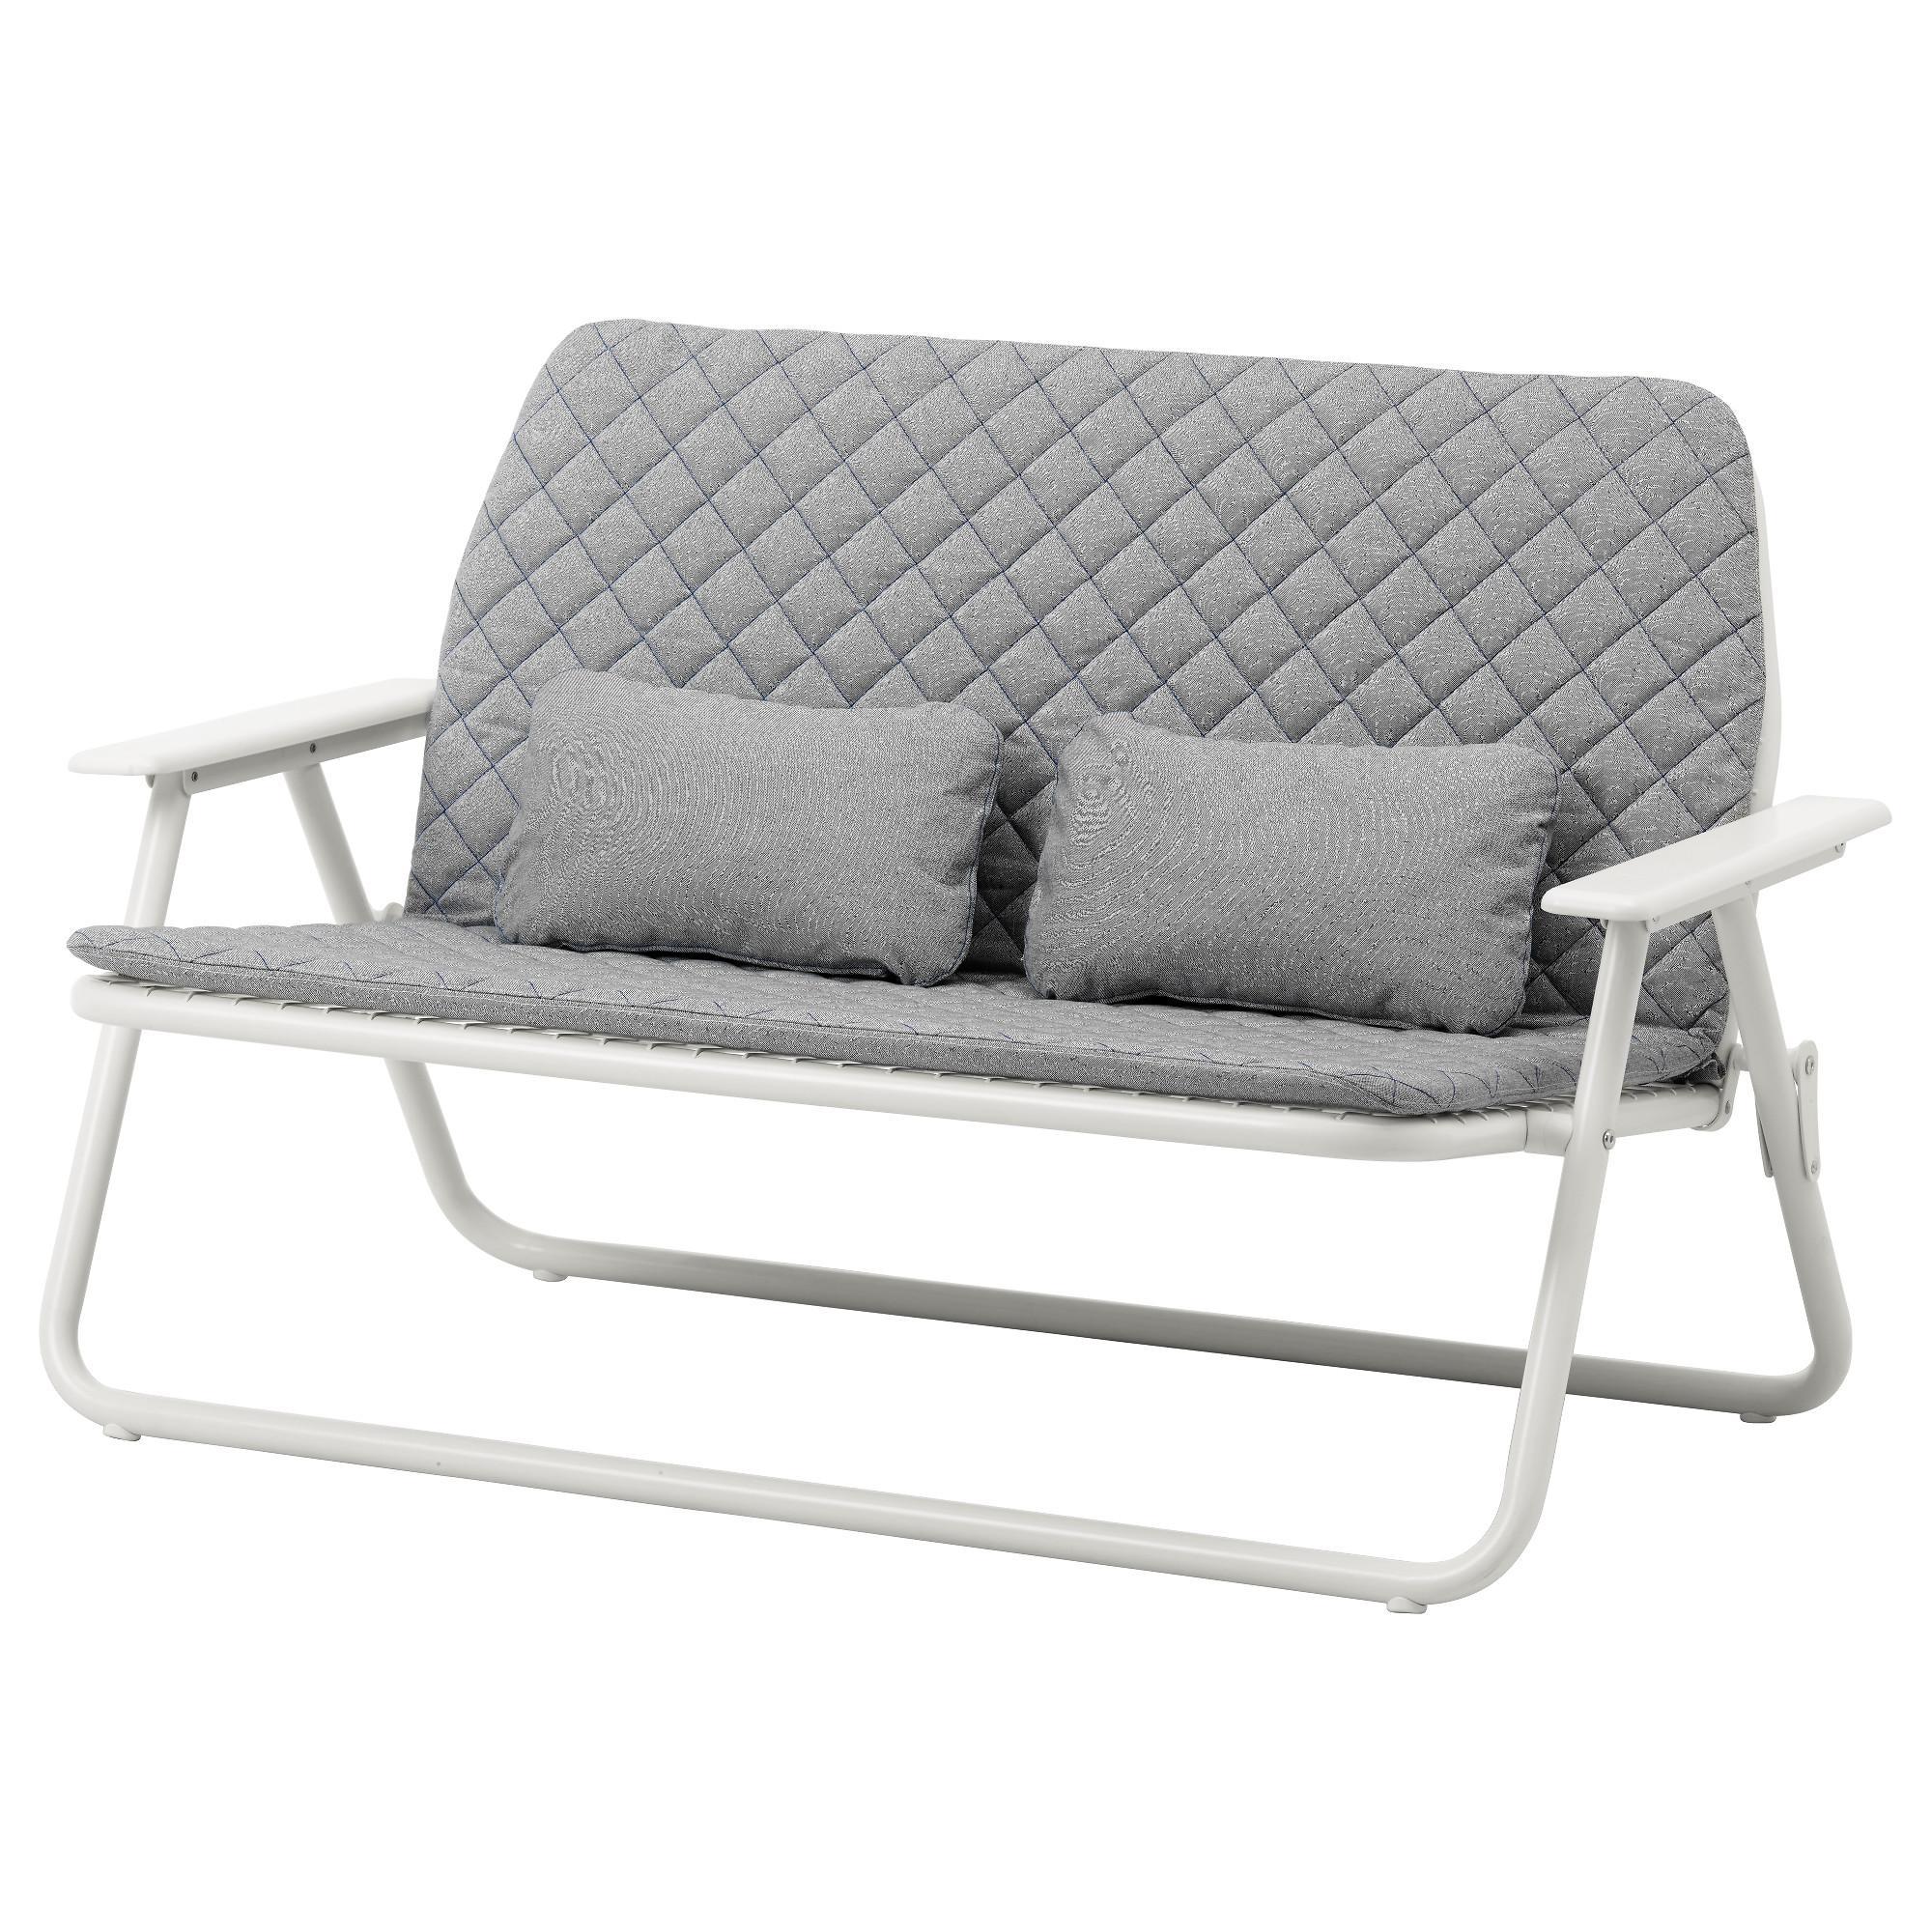 Ikea Ps 2017 2 Seat Sofa Folding – Ikea In Fold Up Sofa Chairs (View 13 of 22)